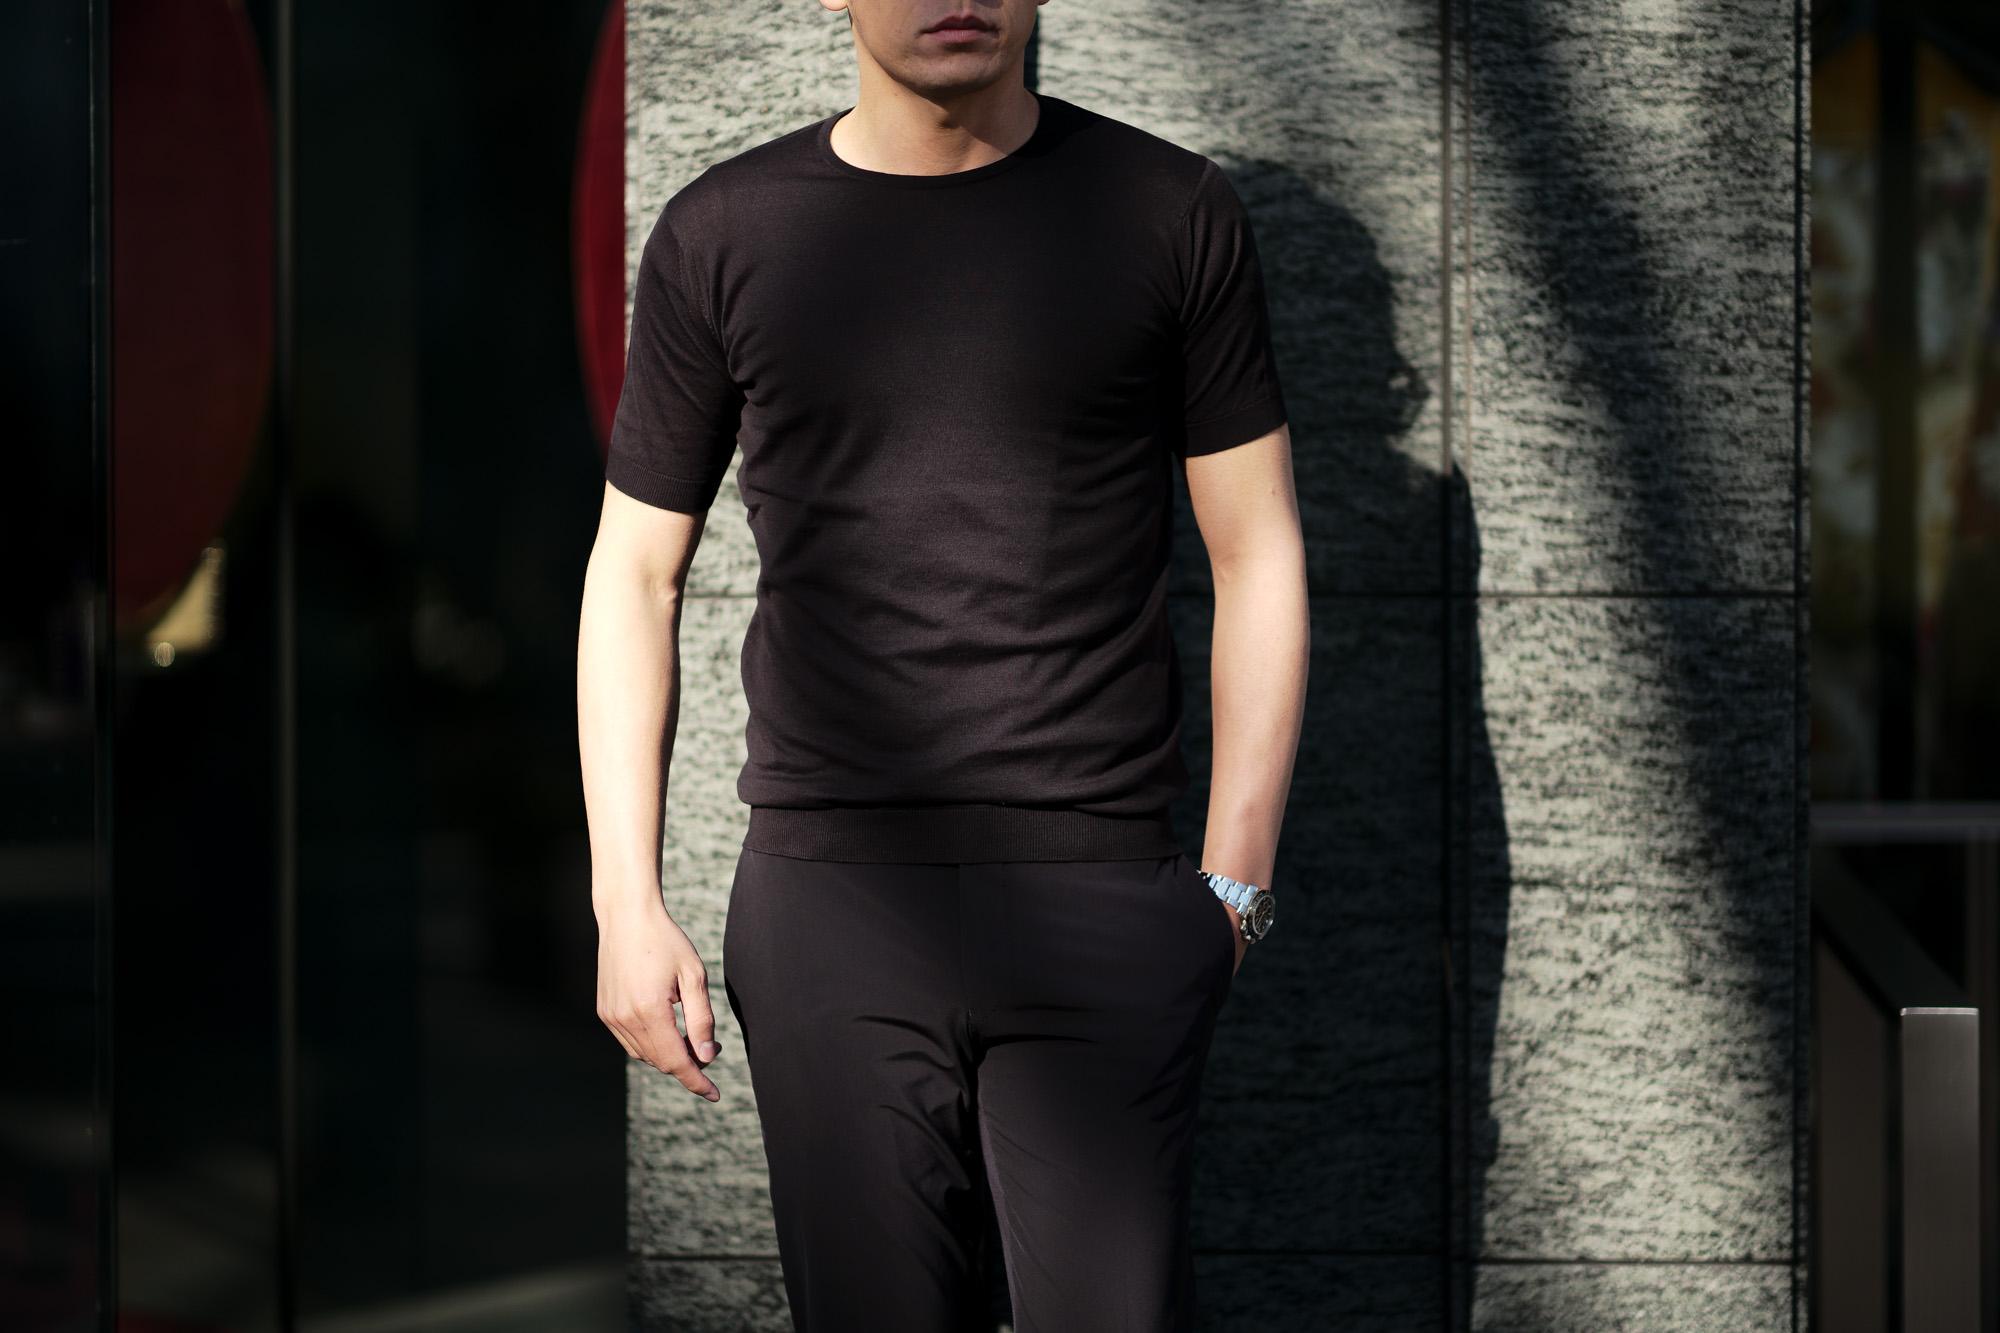 JOHN SMEDLEY(ジョンスメドレー) BELDEN (ベルデン) SEA ISLAND COTTON (シーアイランドコットン) ショートスリーブ コットンニット Tシャツ BLACK (ブラック) Made in England (イギリス製) 2020 春夏新作  愛知 名古屋 altoediritto アルトエデリット